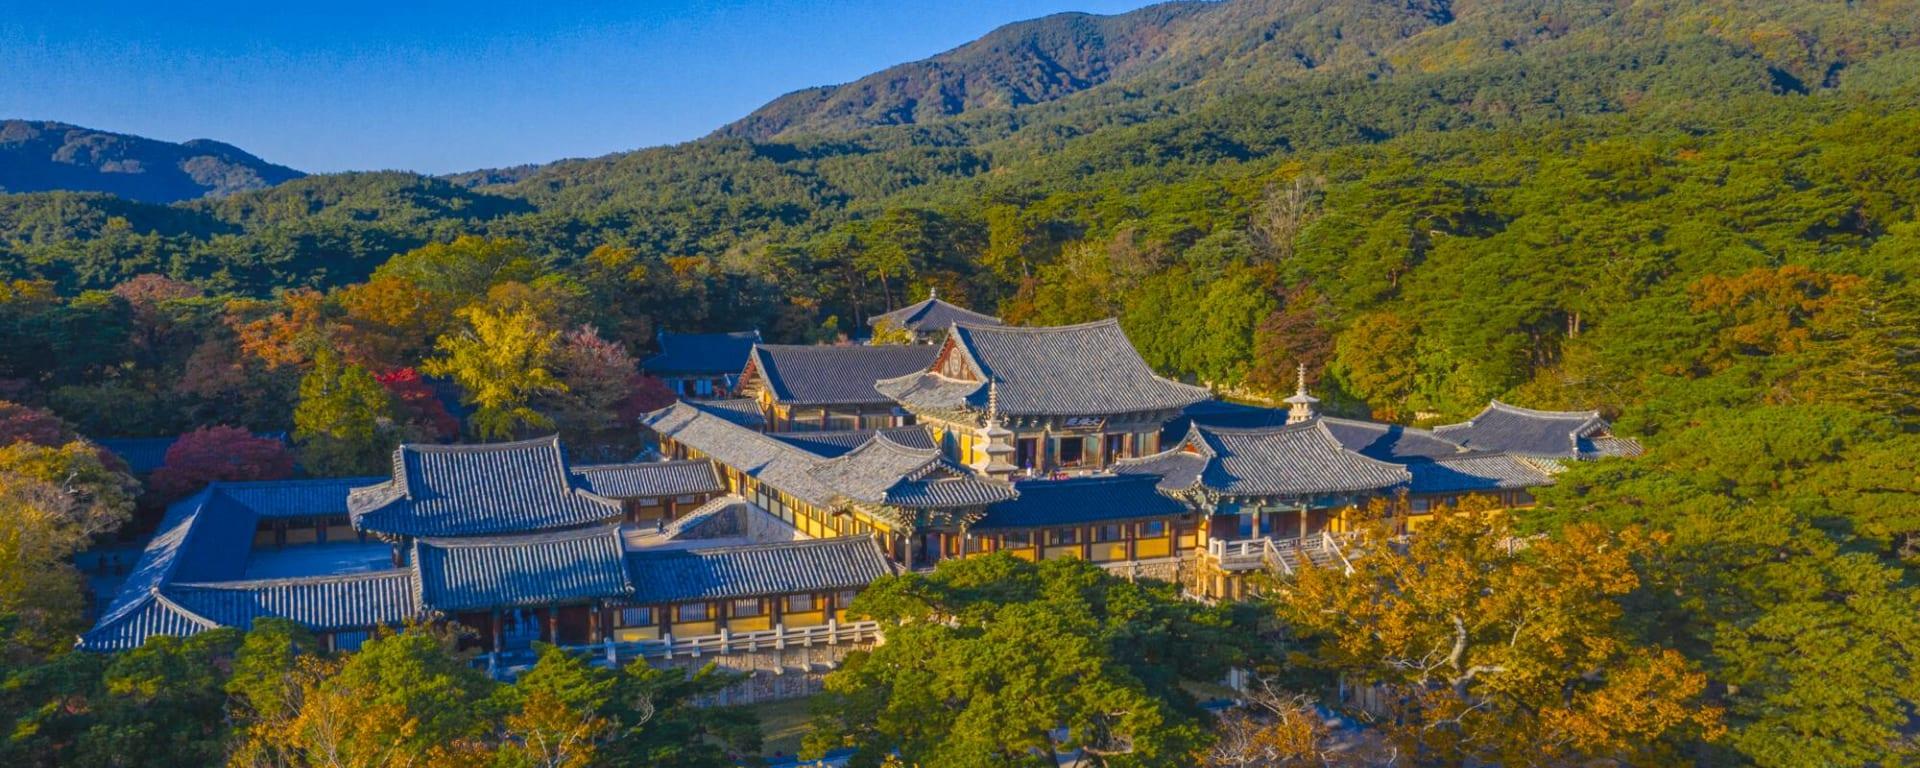 Südkorea entdecken mit Tischler Reisen: Korea Gyeongju Bulguksa Tempel